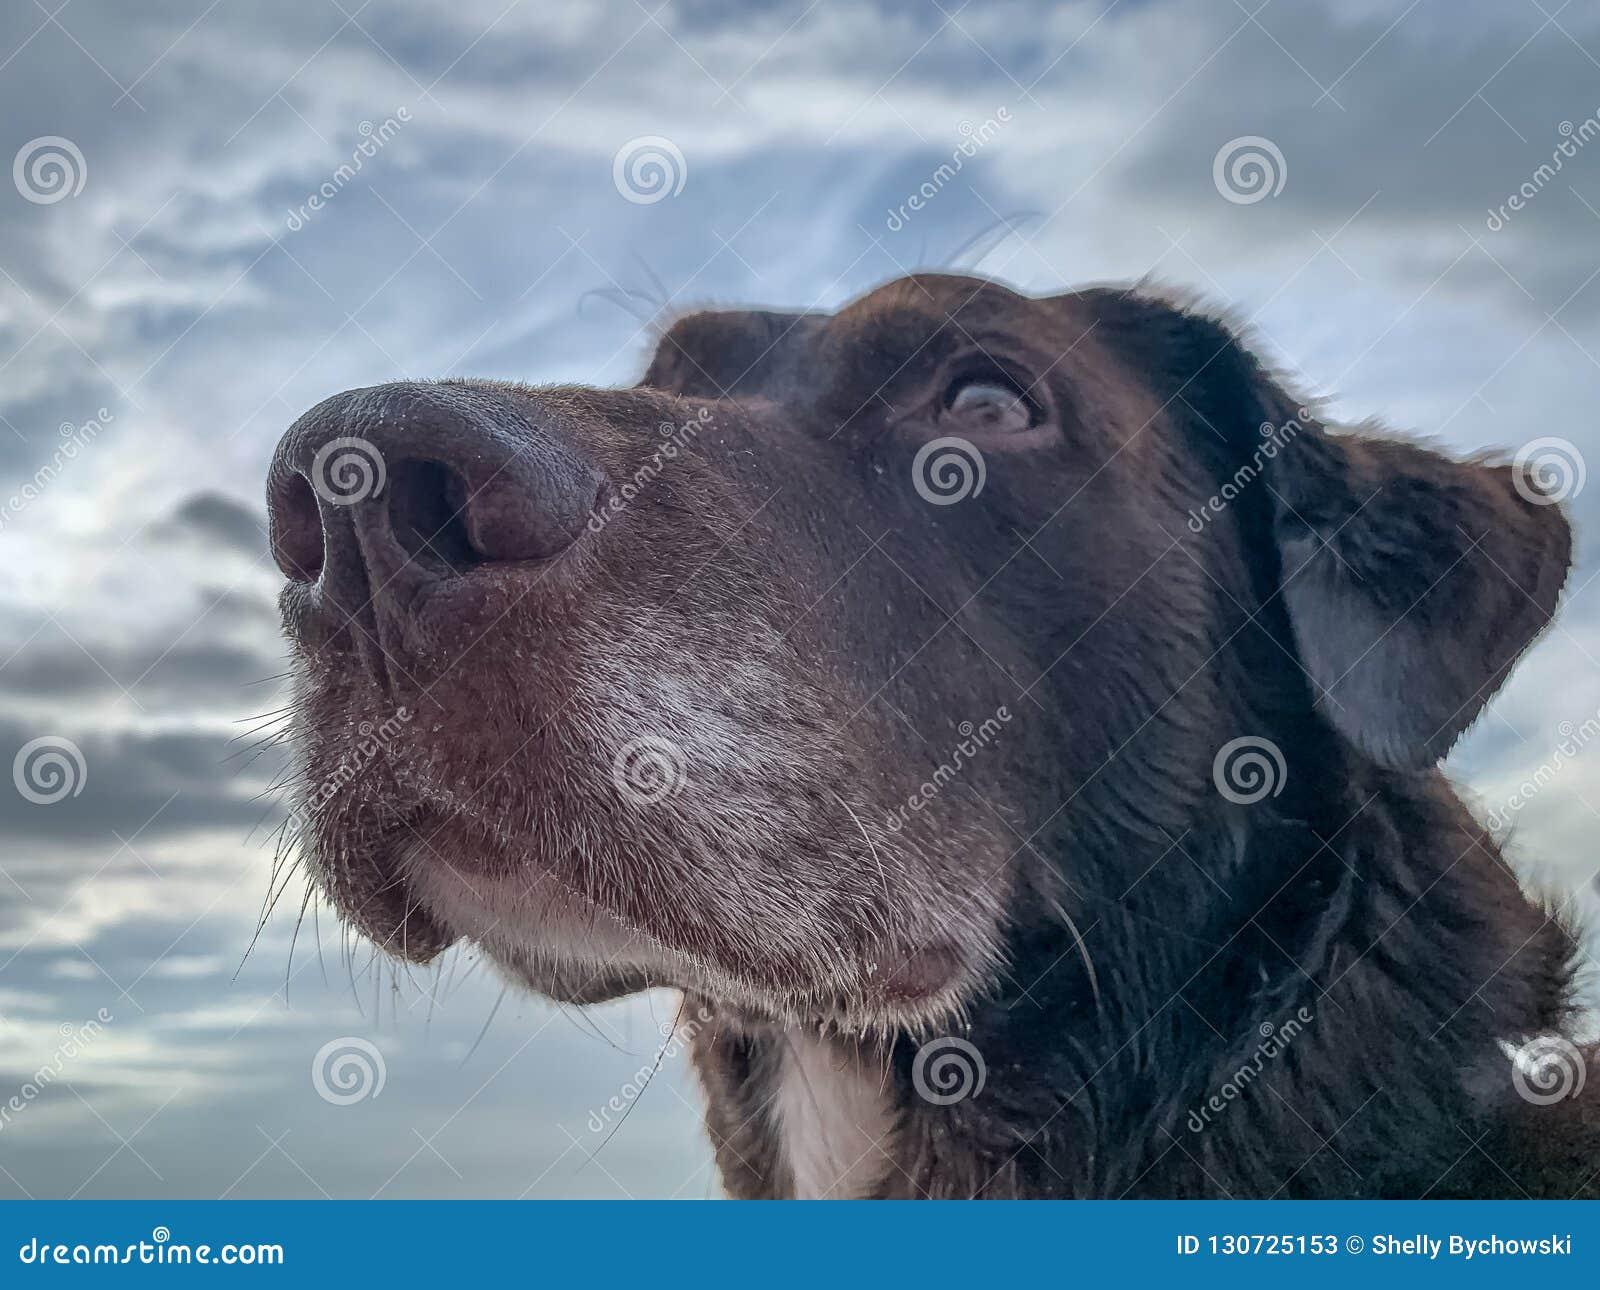 Chocolate Labrador Retriever looking off into distance